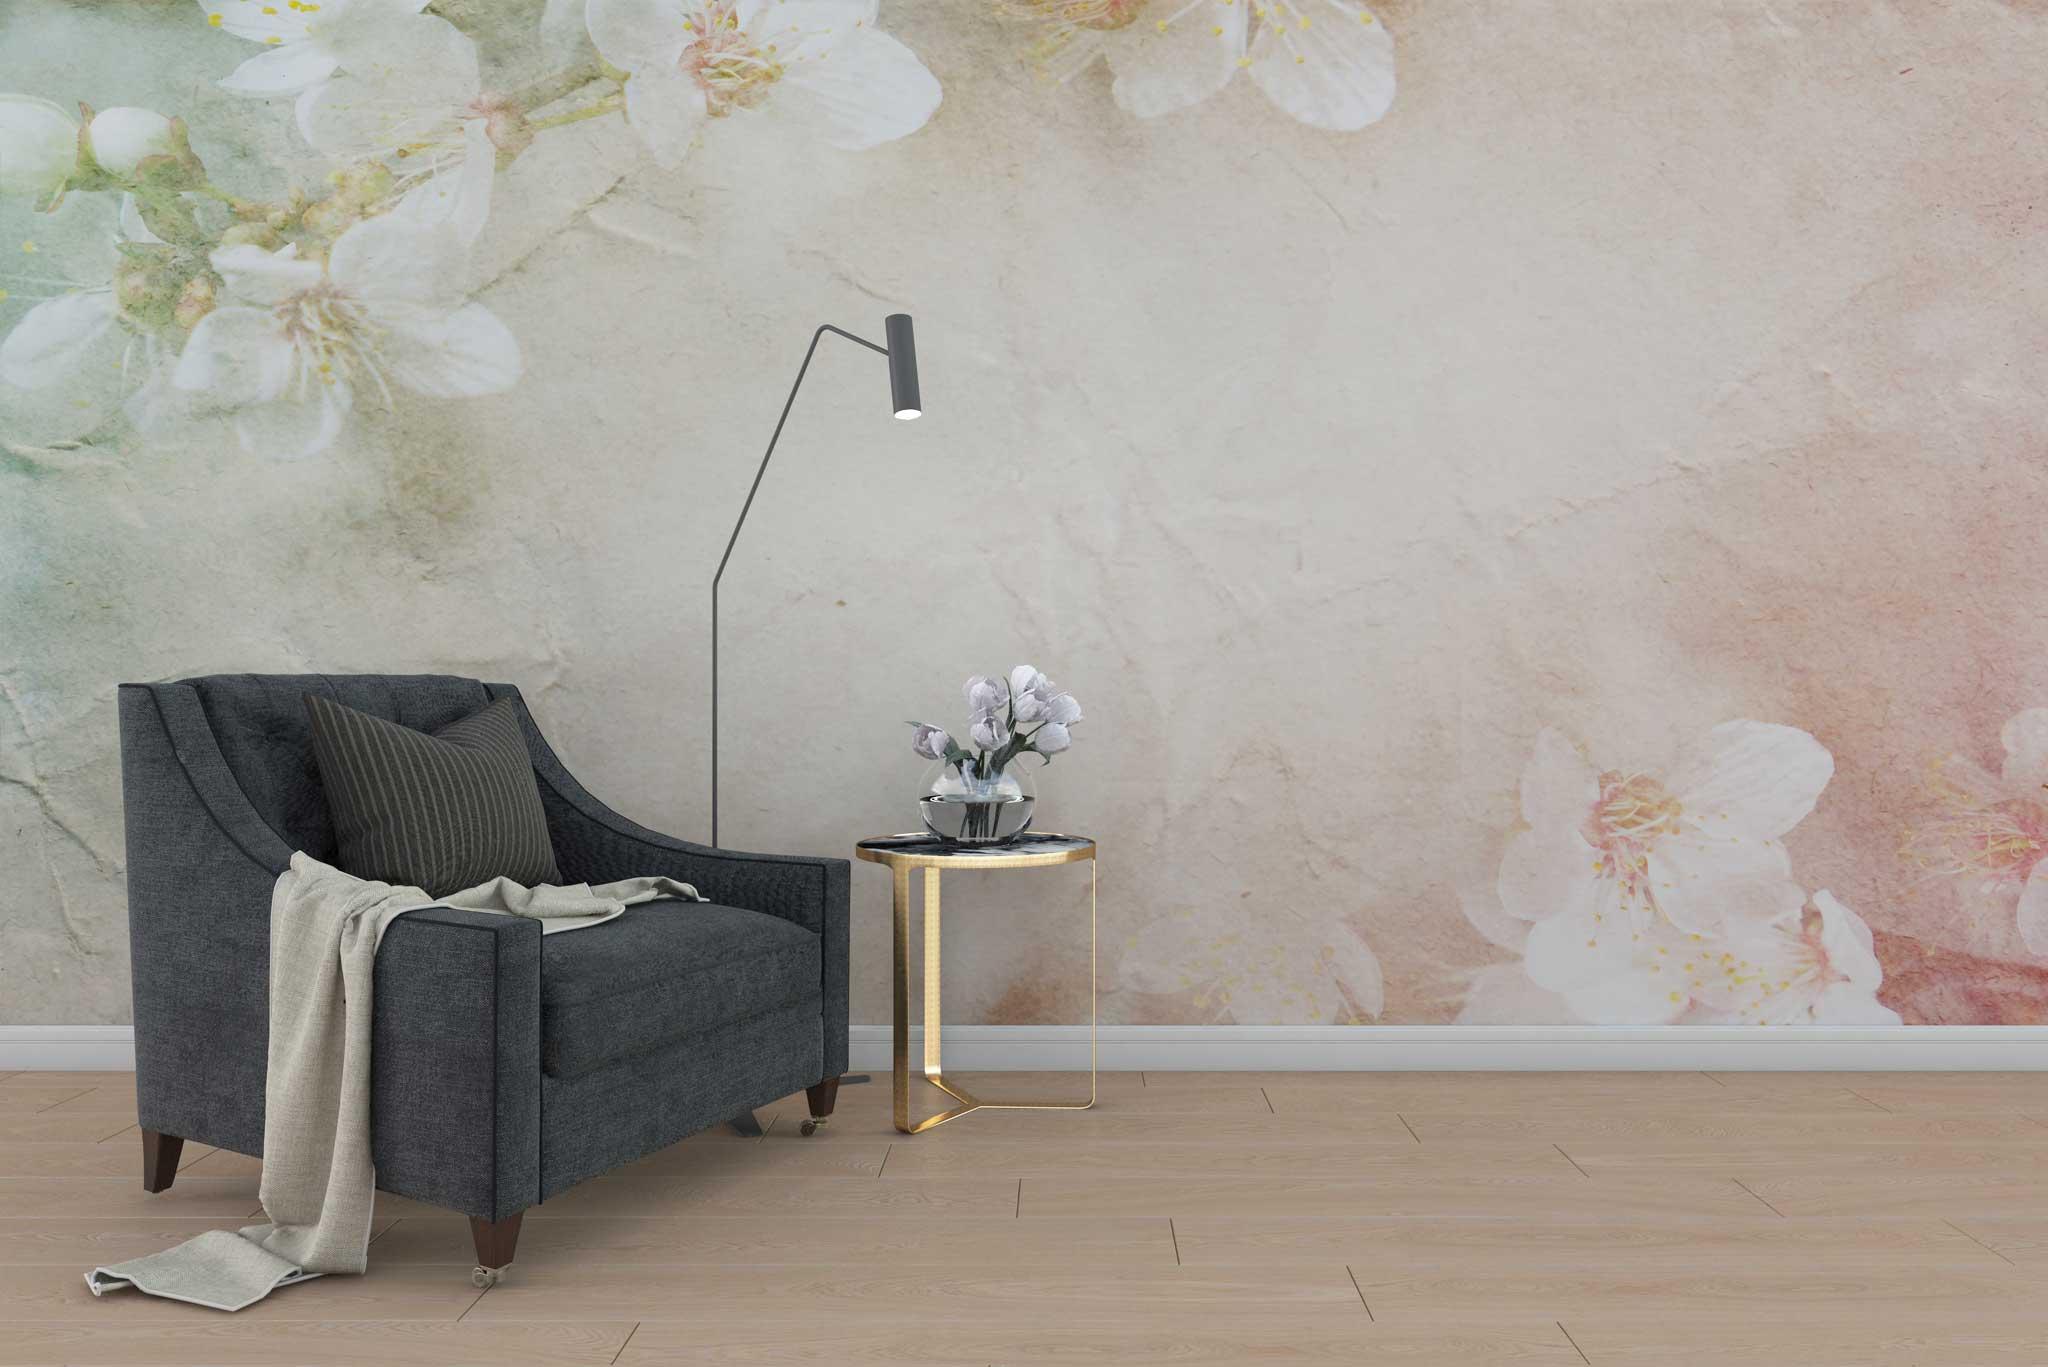 tapet-fototapet-special-personalizat-customizabil-comanda-bucuresti-daring-prints-model-floral-flori-cires-stil-vintage-romantic-pastel